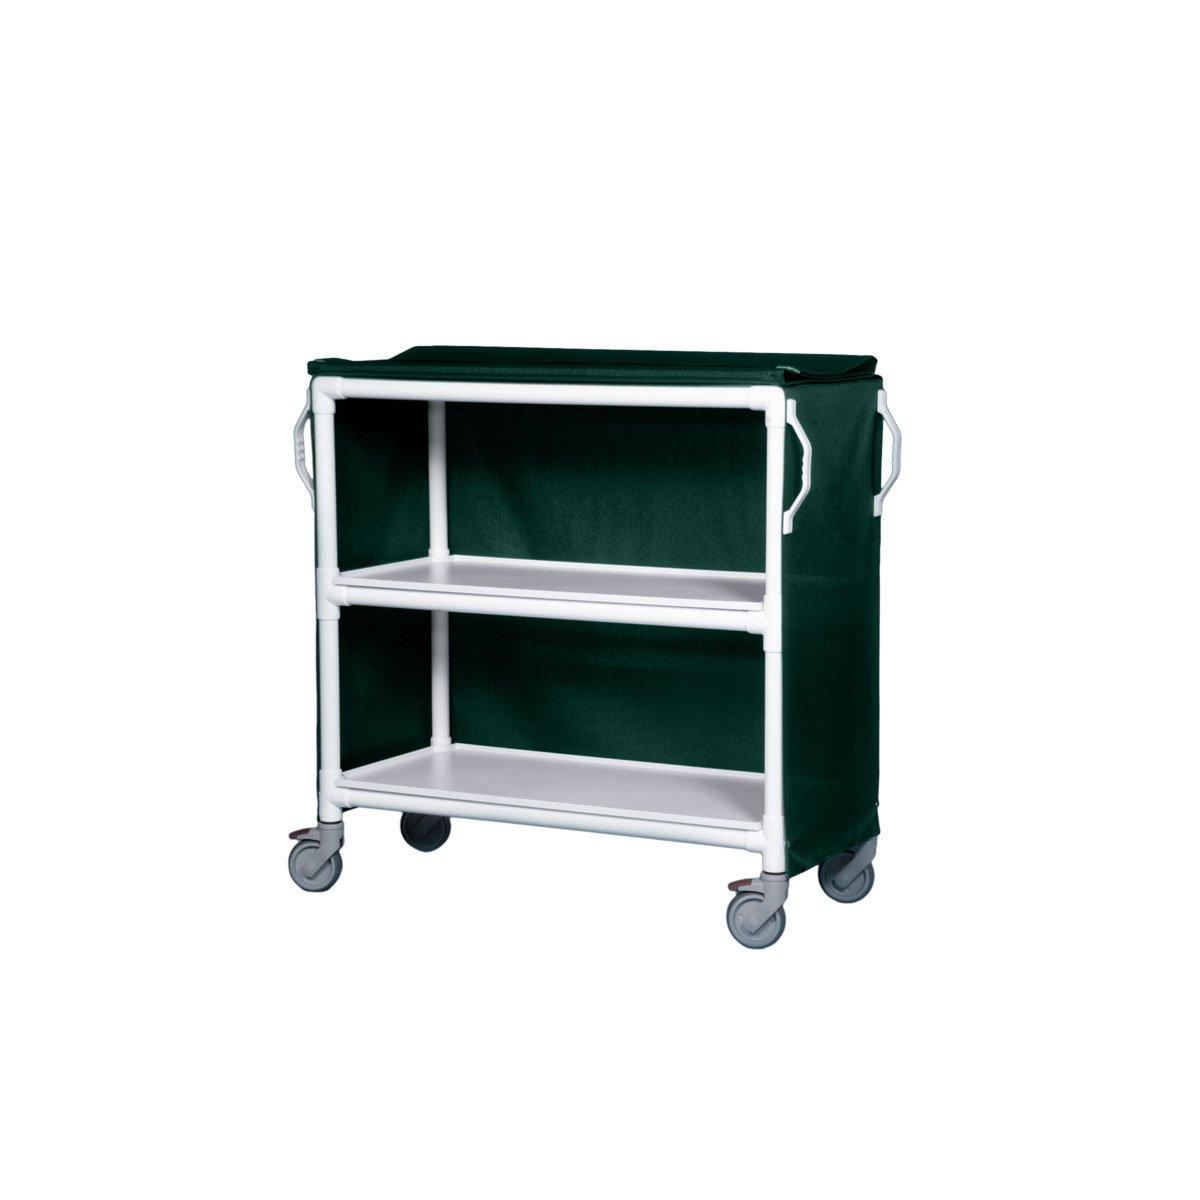 2 Shelf Linen Cart Surprise price - 46